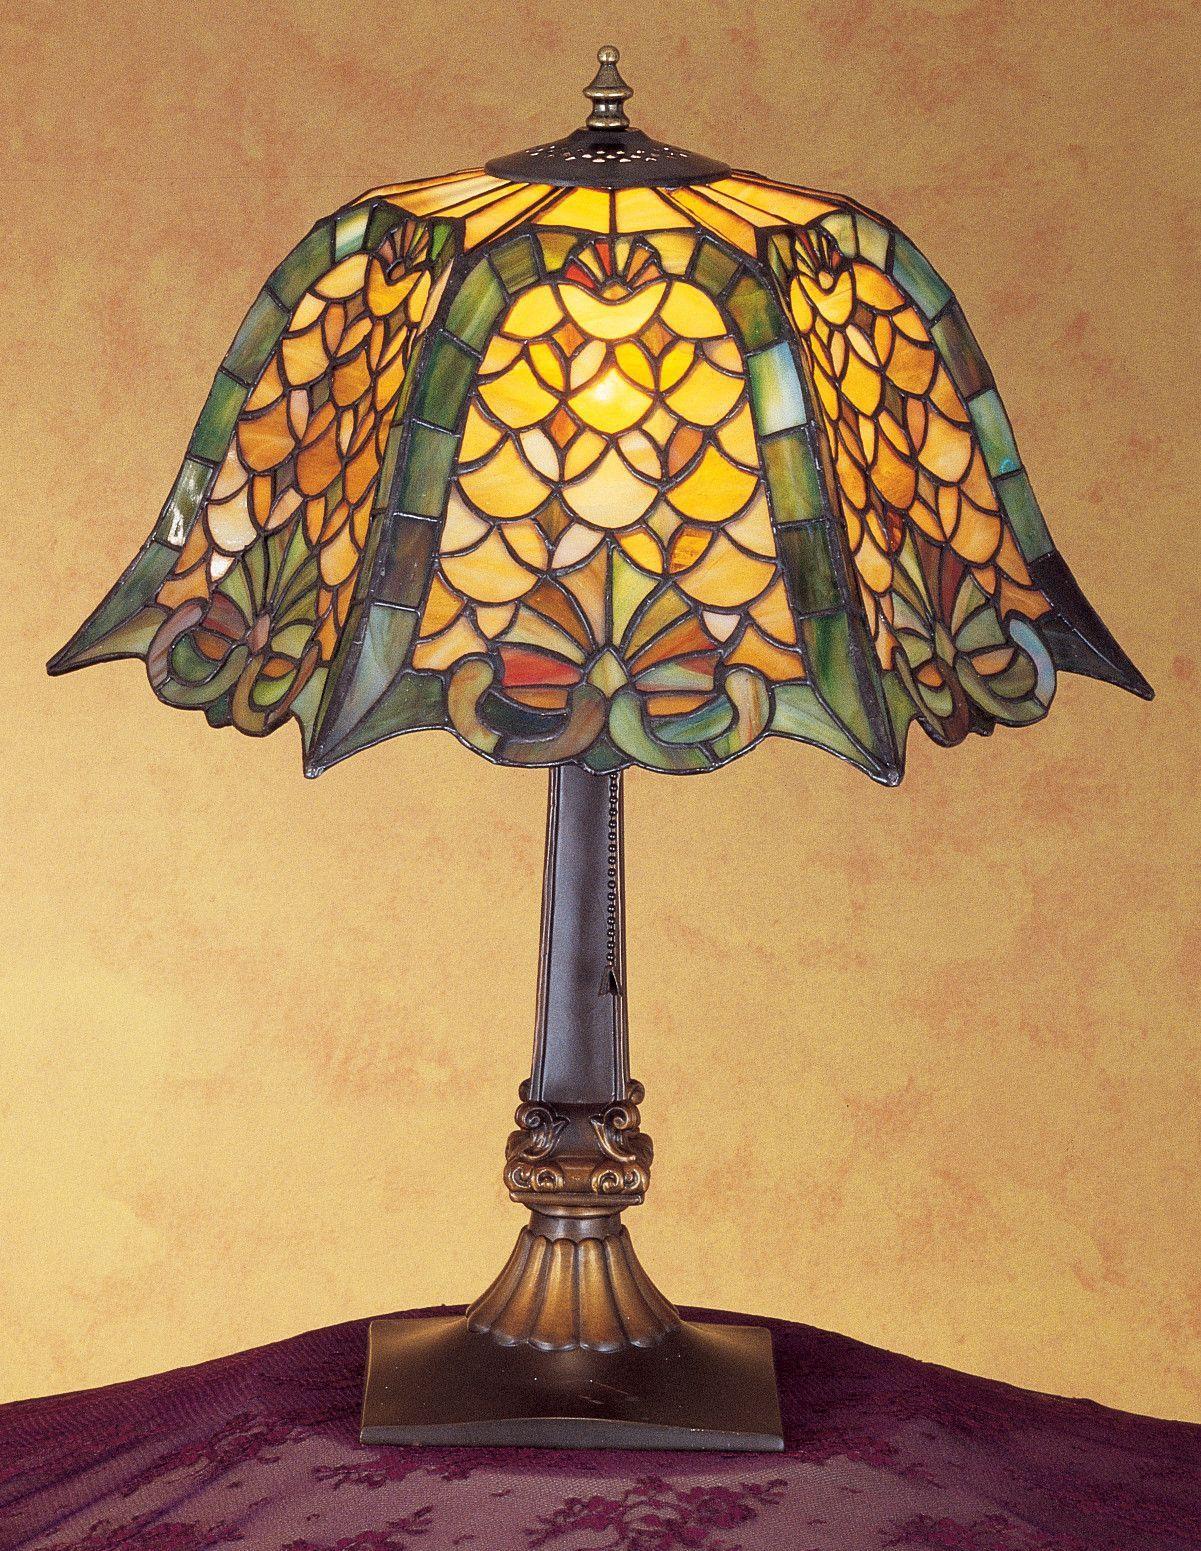 Meyda 19 5 H D K Shell Diamond Table Lamp Table Lamp Tiffany Table Lamps Lamp